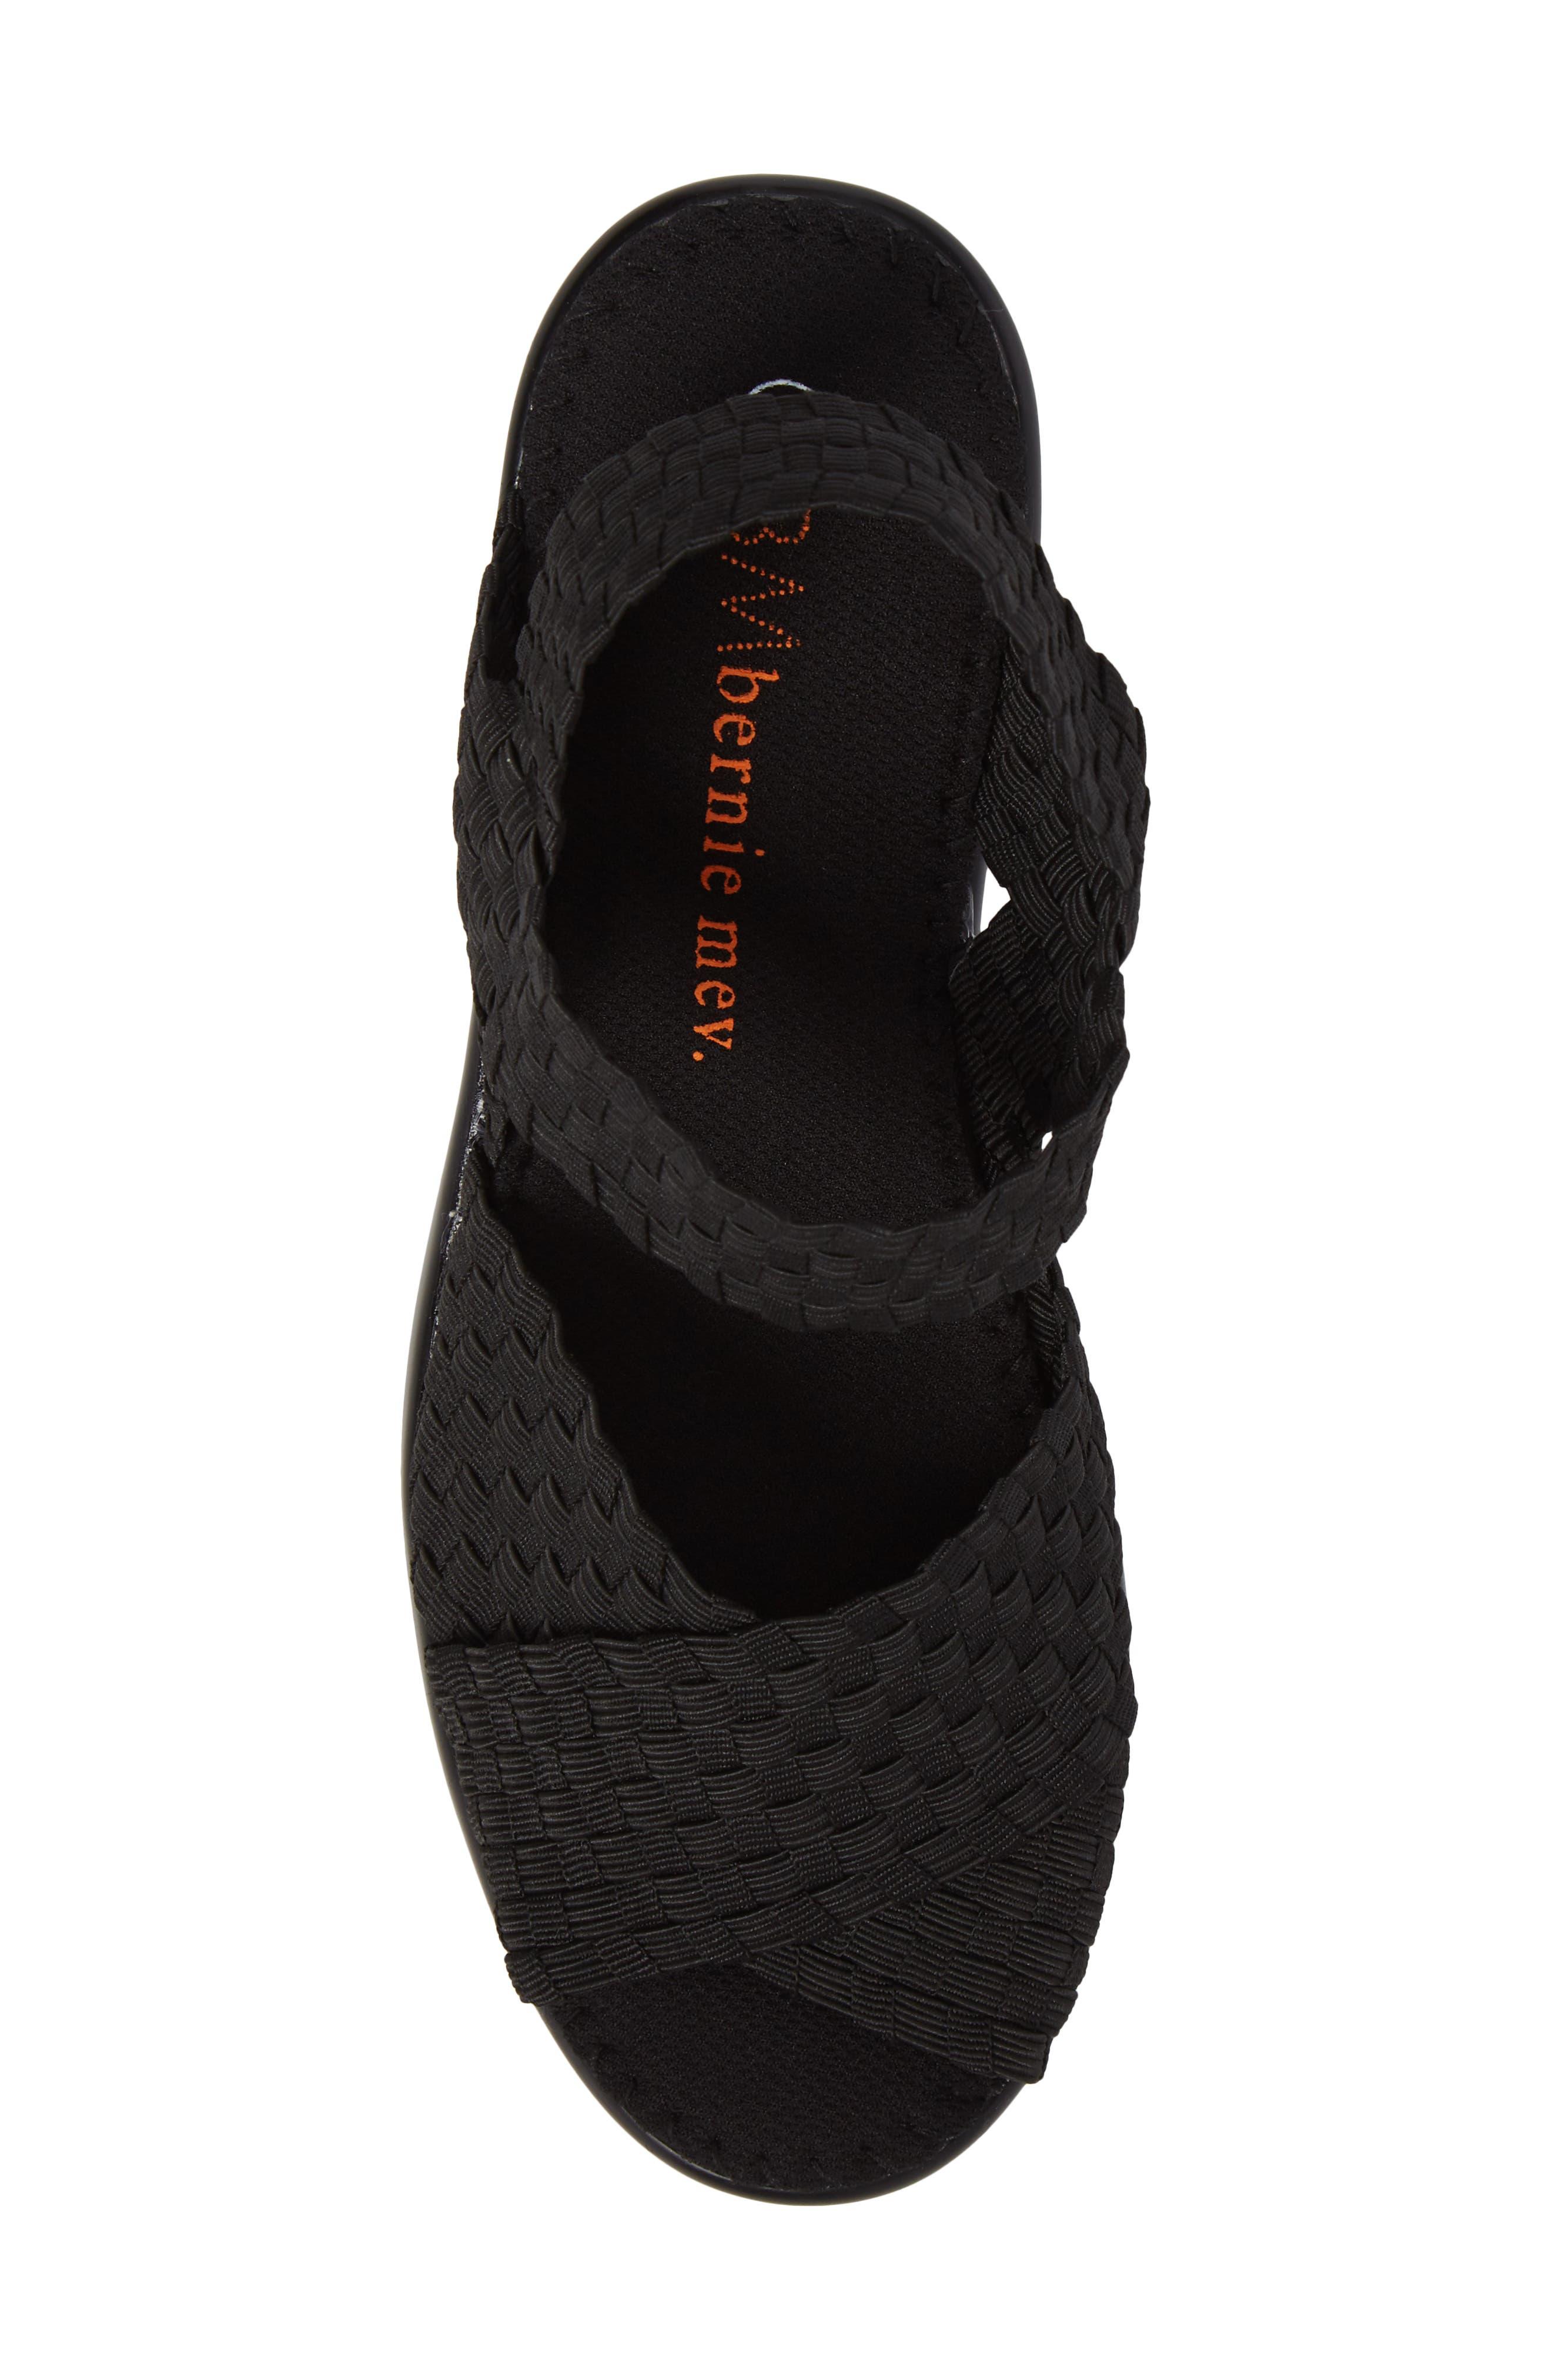 Fresh Buttercup Sandal,                             Alternate thumbnail 5, color,                             BLACK FABRIC